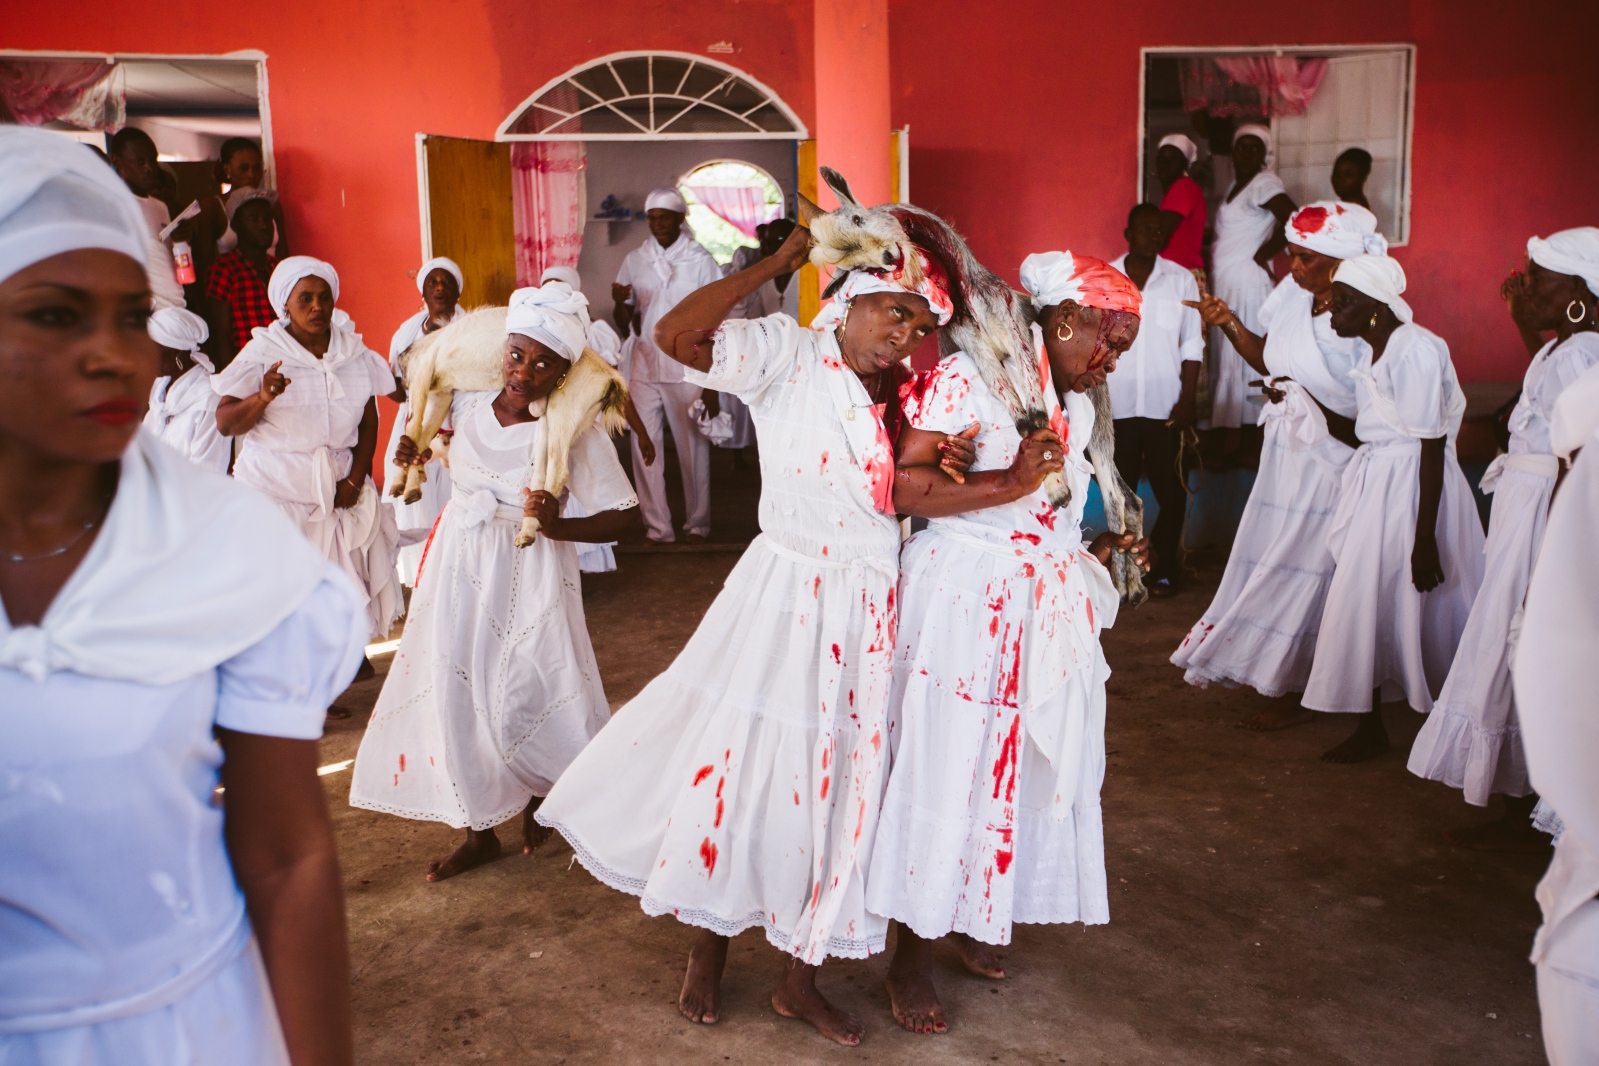 Art and Documentary Photography - Loading f__te_des_rois_vaudou_haiti-4.jpg